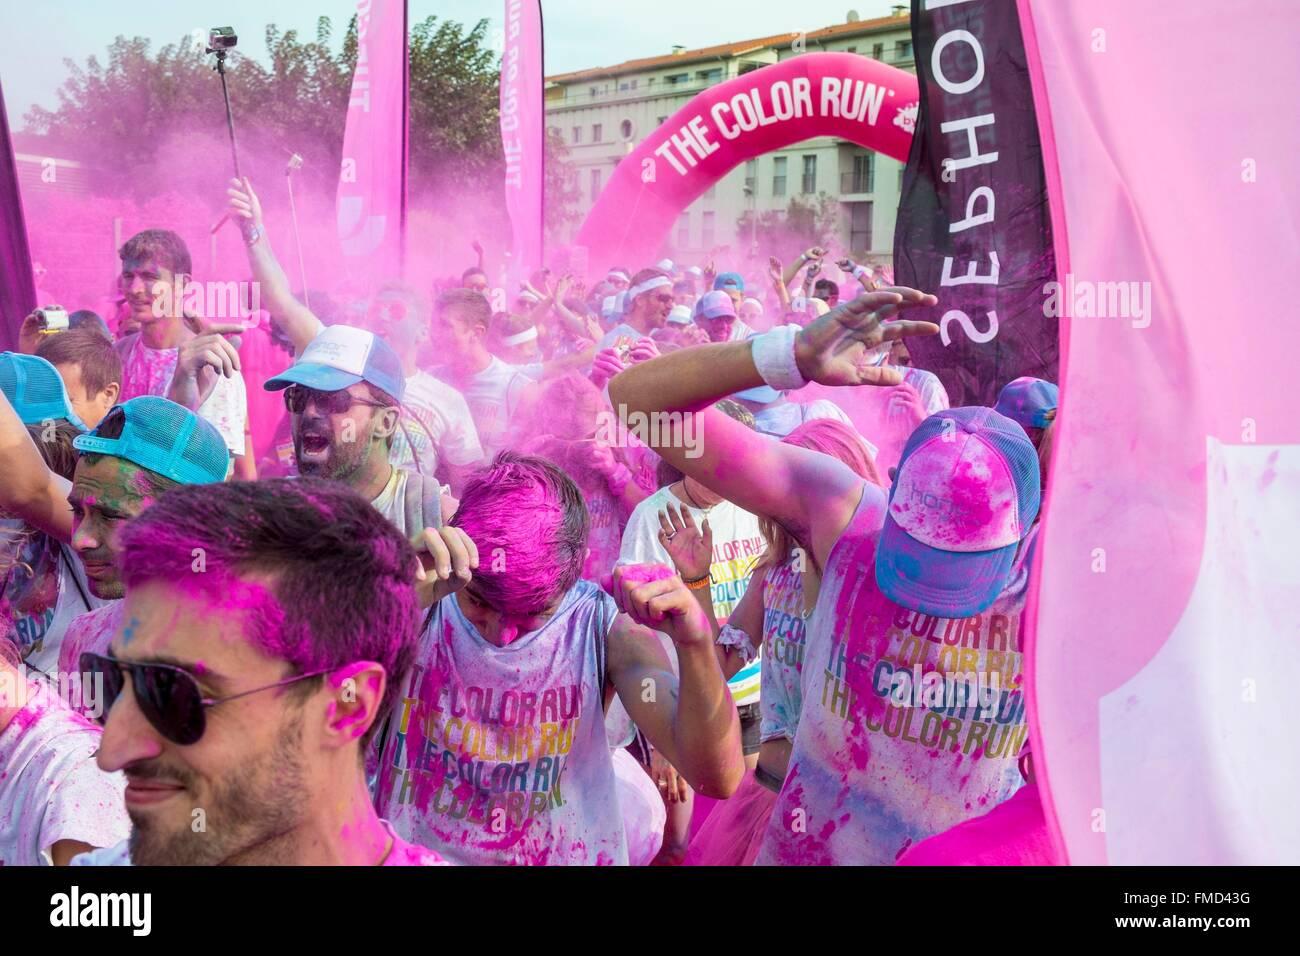 France, Bouches du Rhone, Marseille, The Color Run, race or participants receive the powder paint - Stock Image